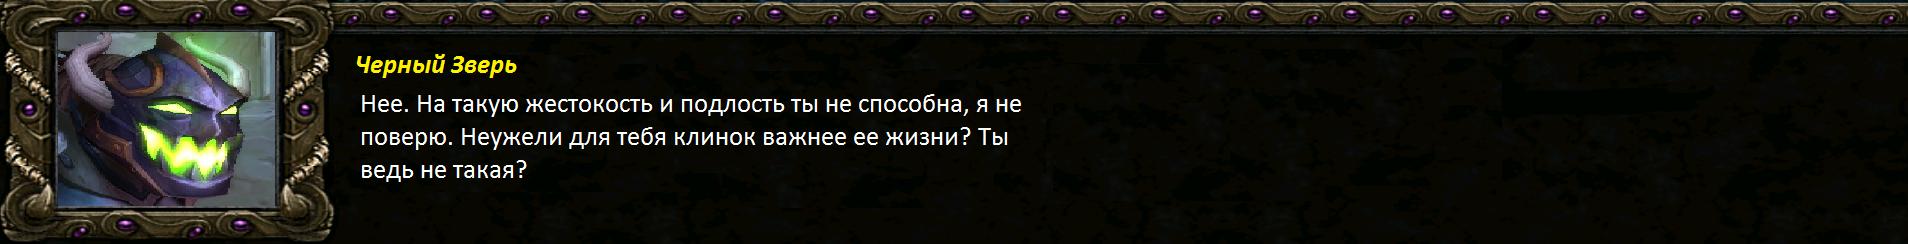 Диалог ДкВар 13 эпизод 26